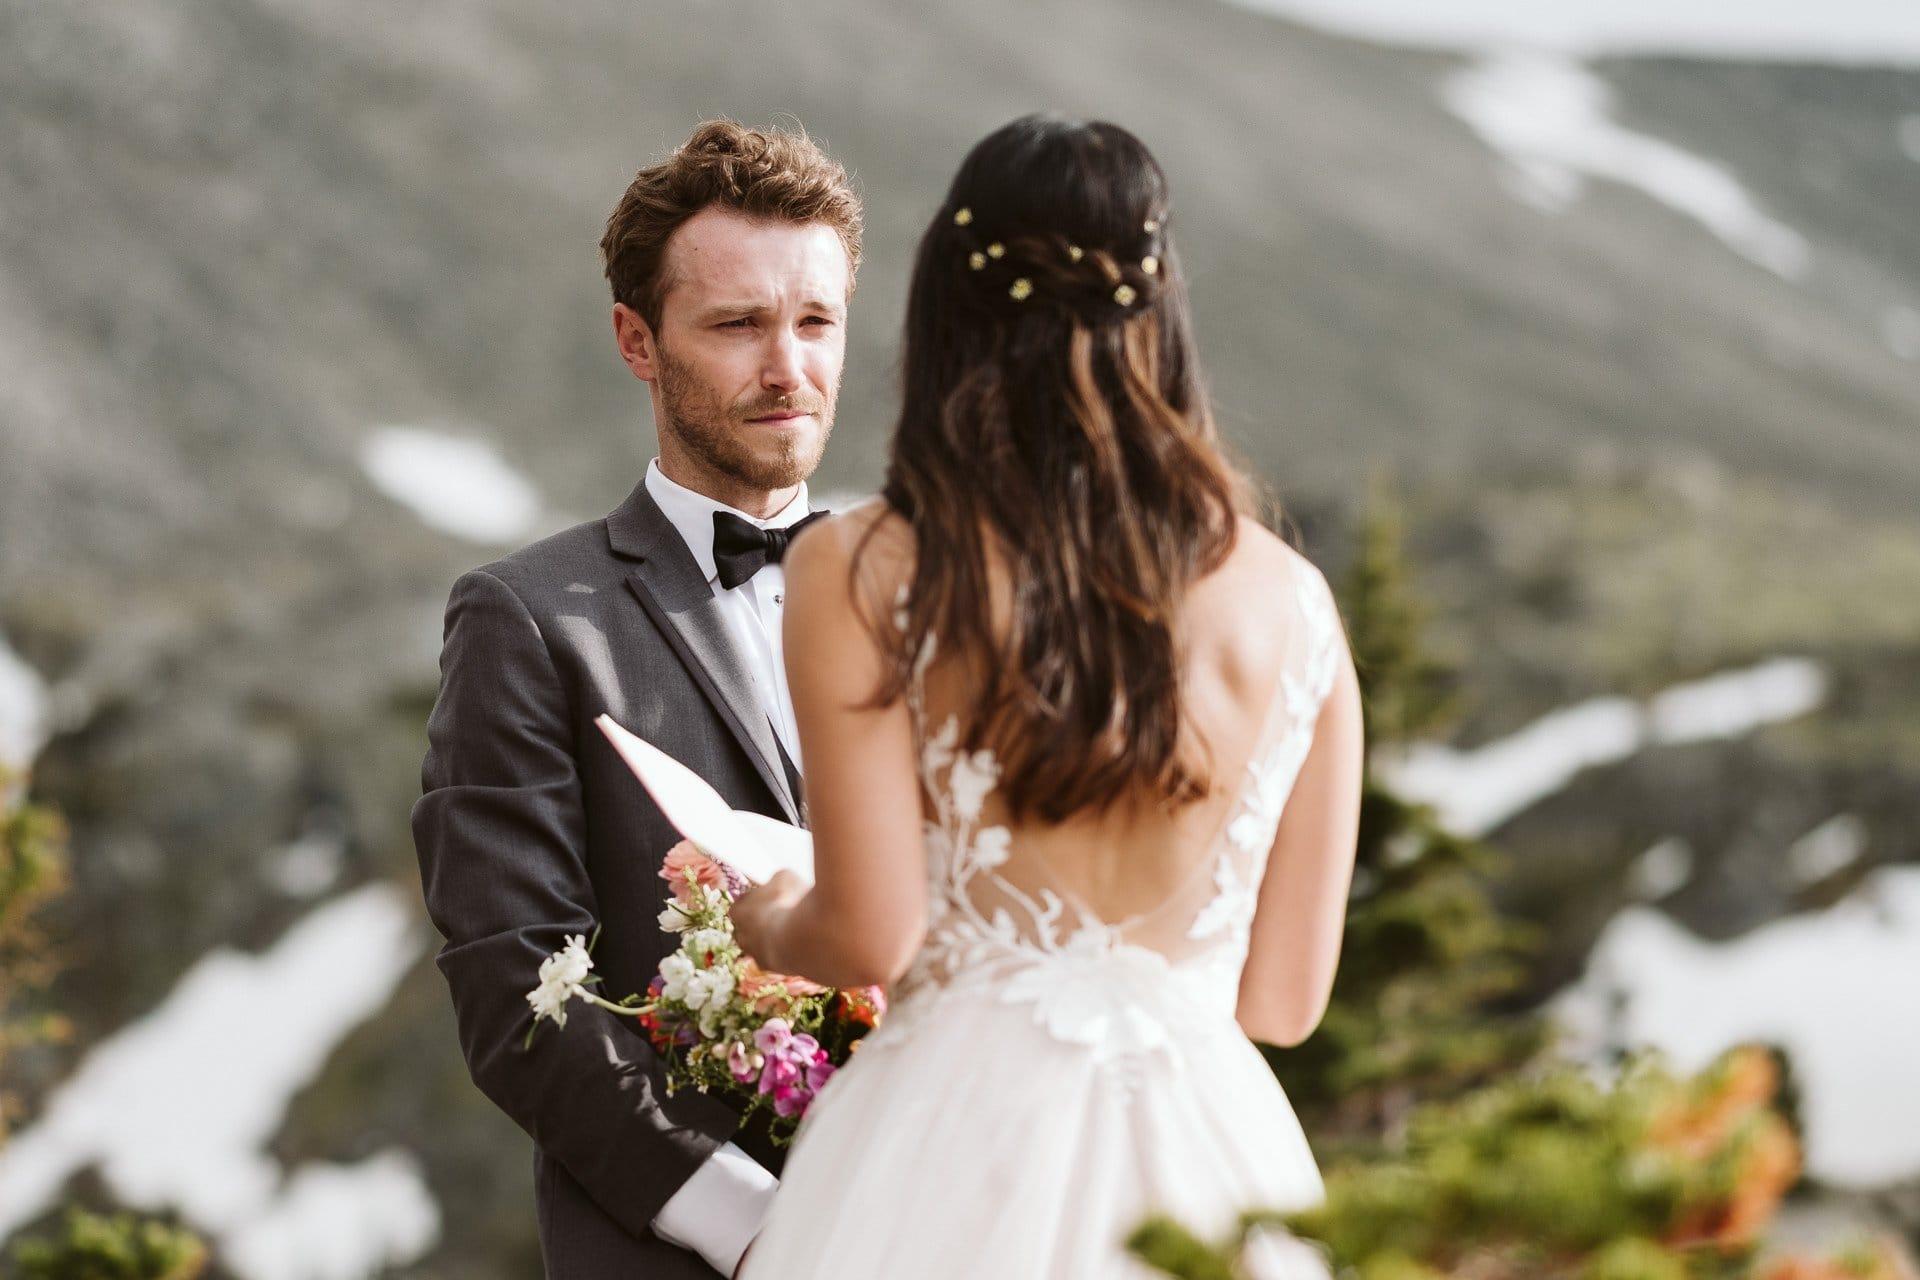 Indian Peaks Wilderness elopement, Colorado adventure elopement photographer, mountain elopement ceremony at alpine lake